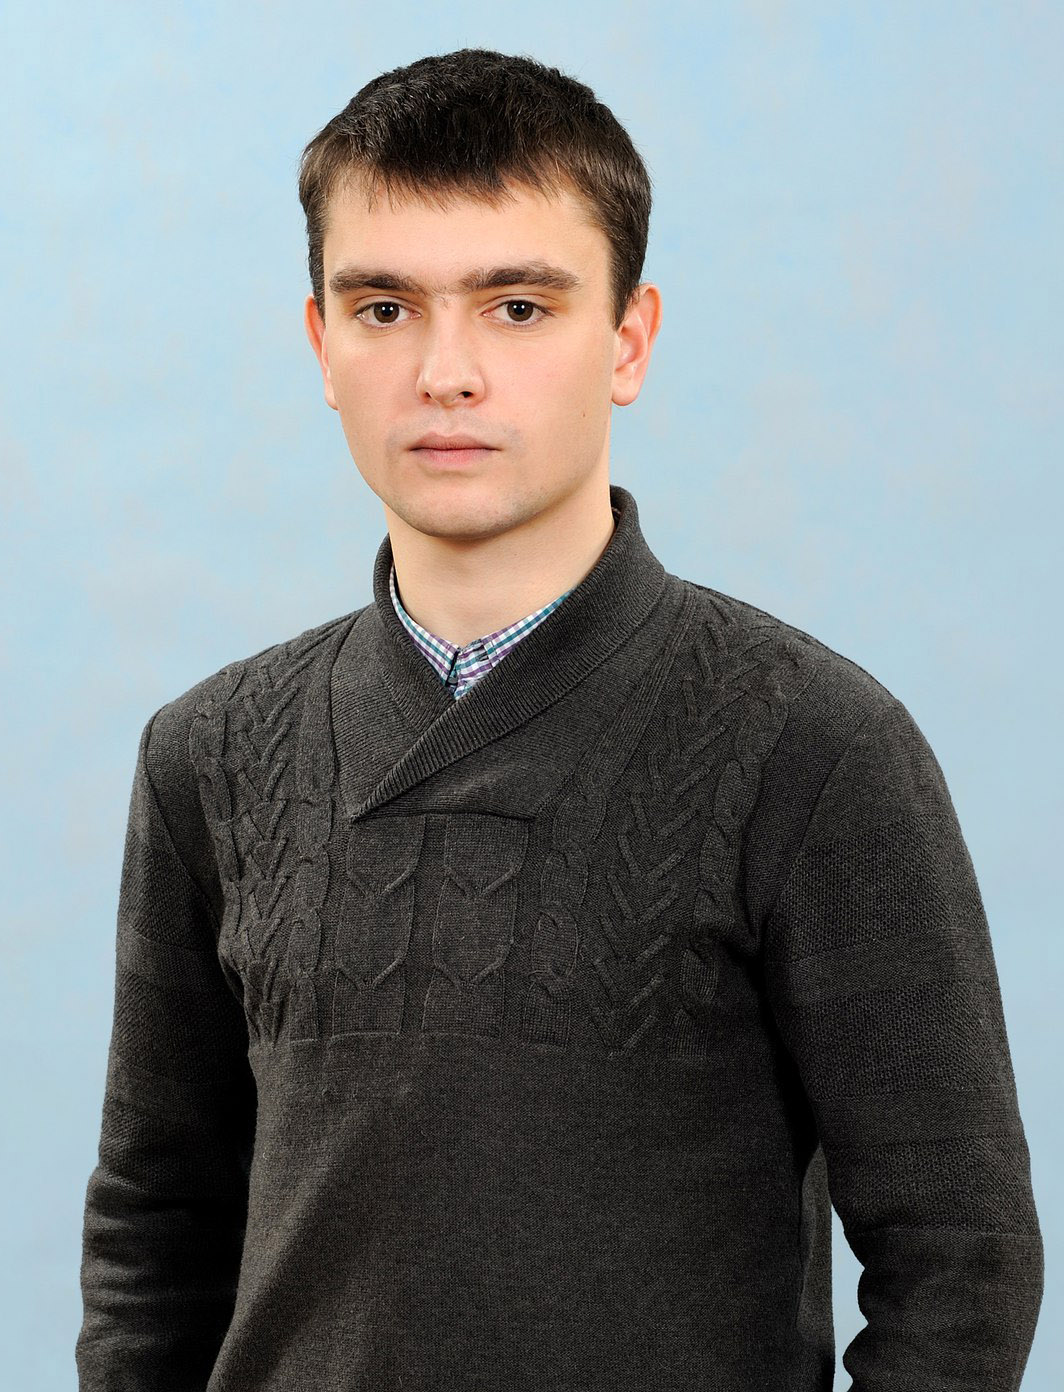 Плотников Дмитрий Владимирович